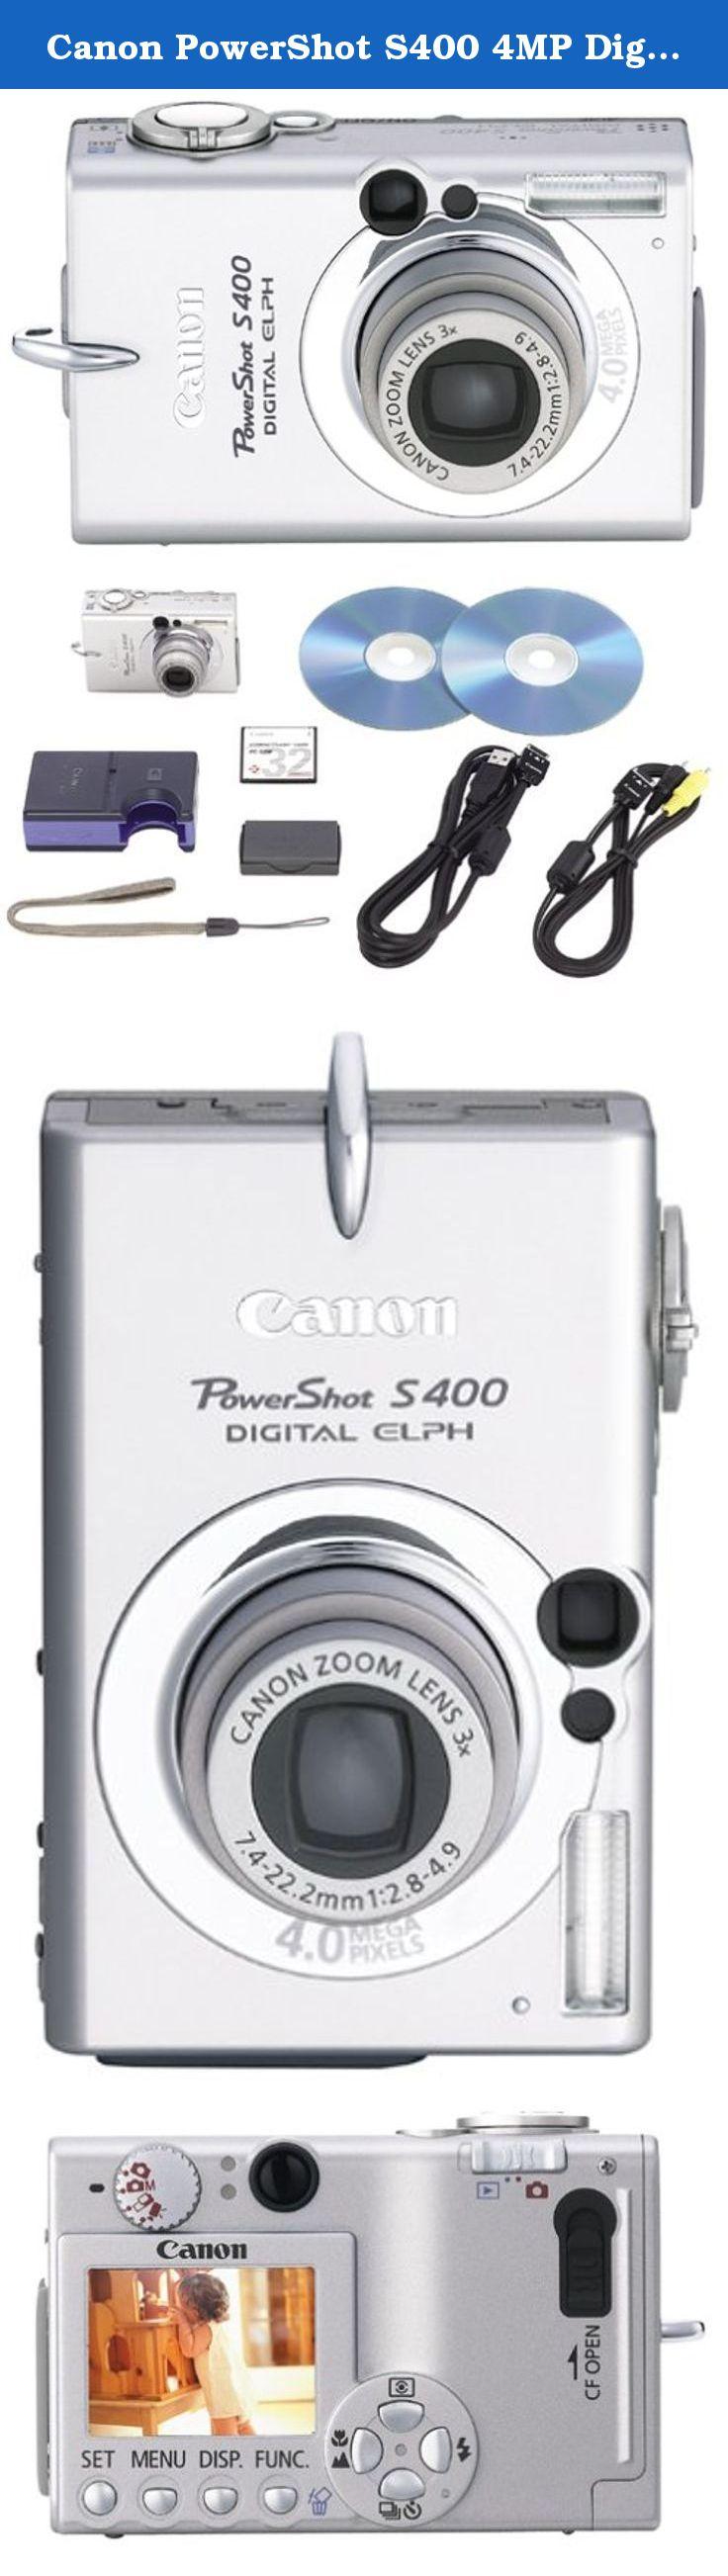 Canon Powershot S400 4mp Digital Camera W 3x Optical Zoom X 6 Mb Compactflash English 1y Warranty F 2 8 4 9a Whole H Digital Camera Powershot Canon Powershot